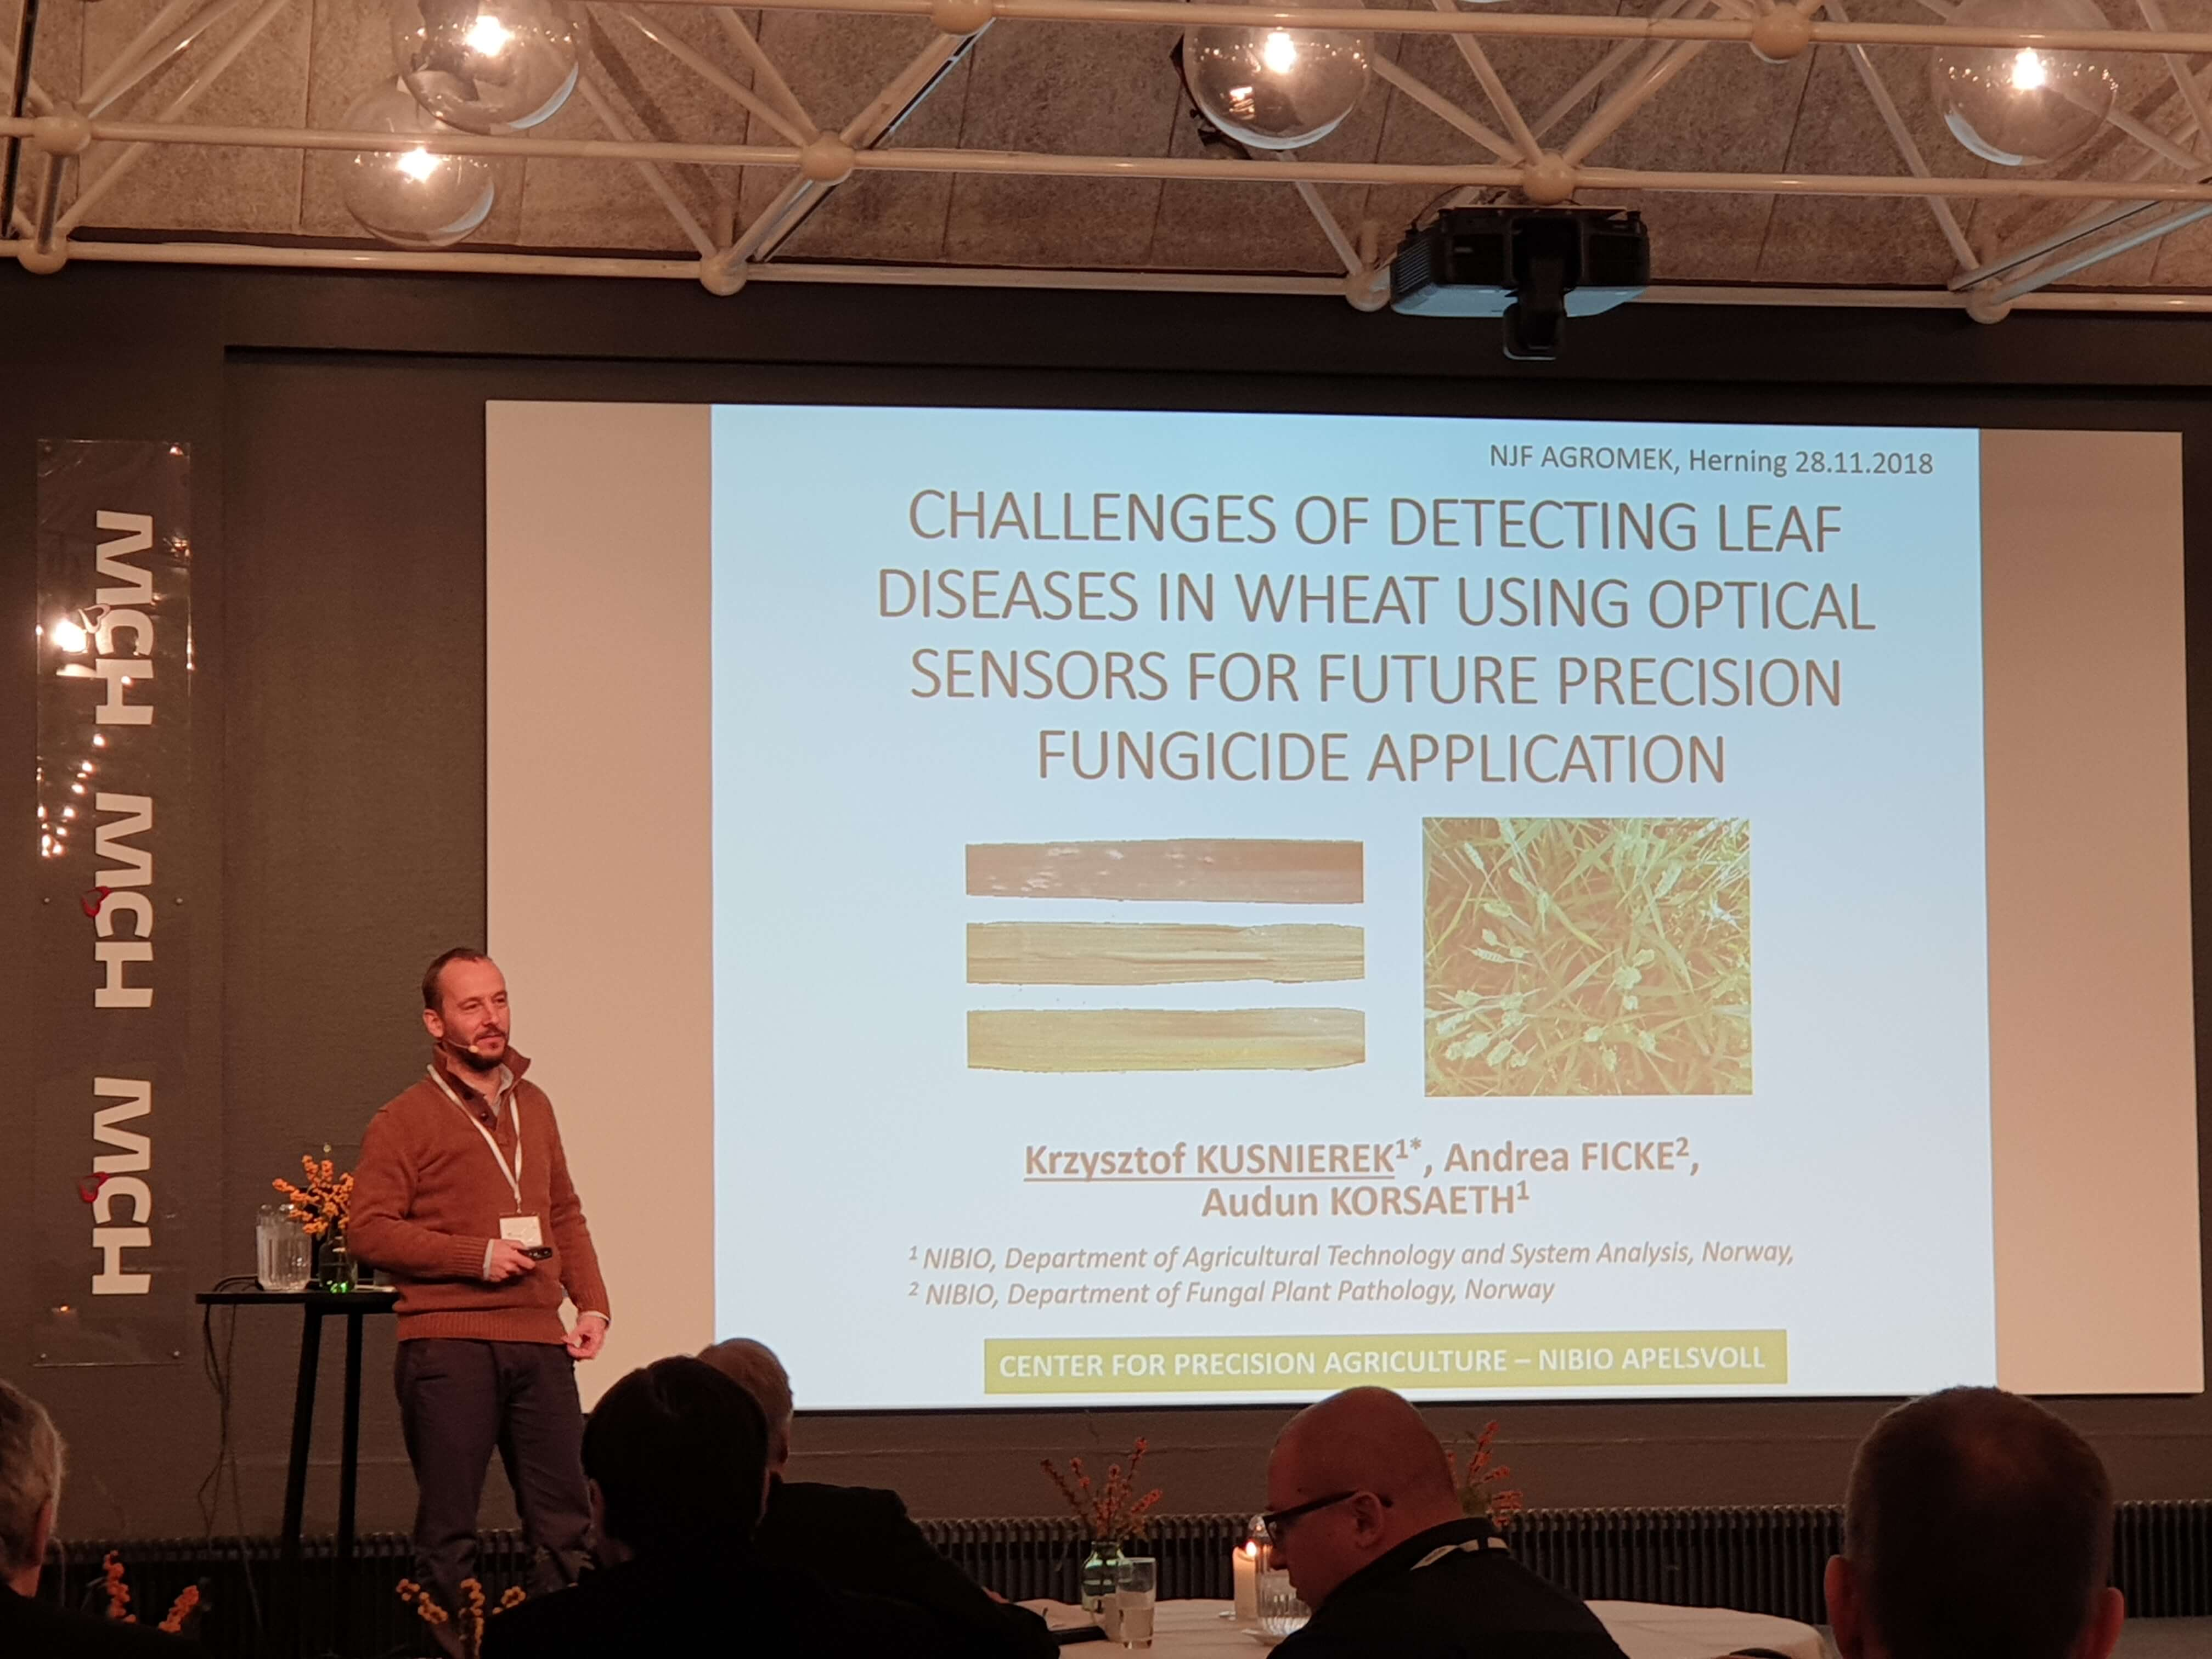 Krzysztof Kusnierek presentation on future precision fungicide application